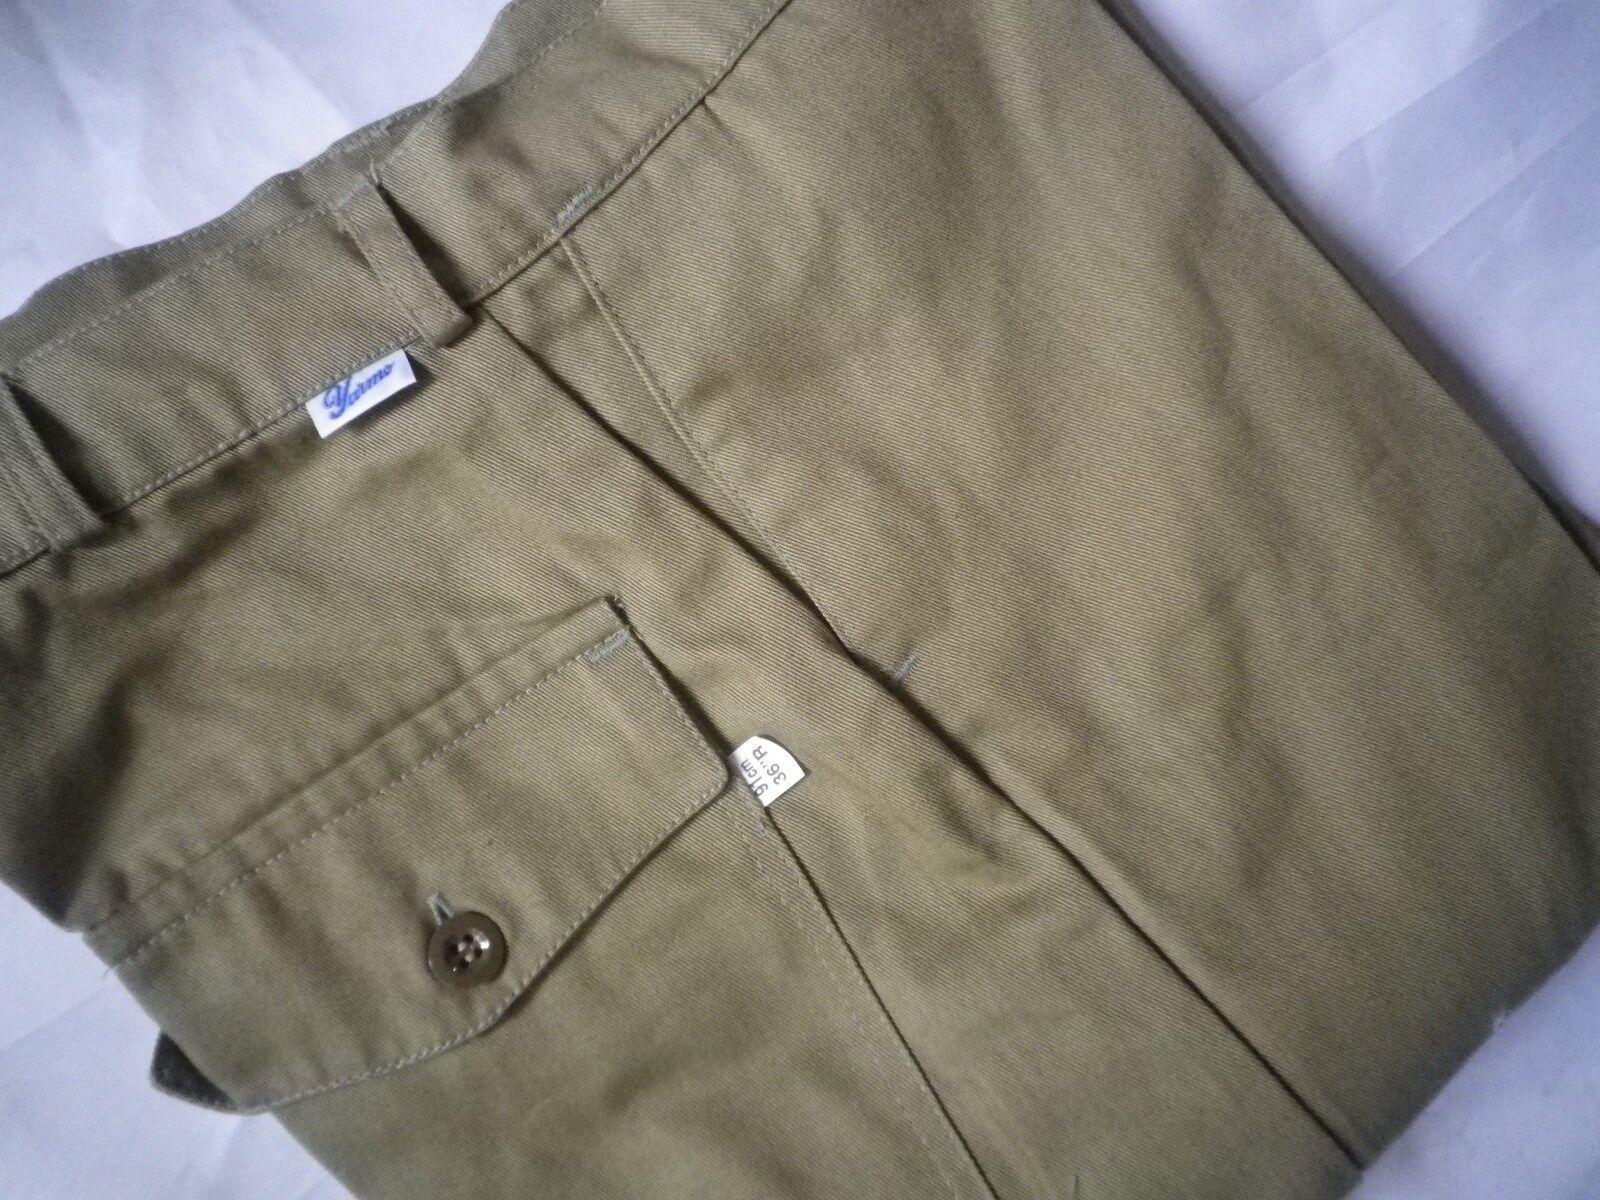 YARMO Utility  Work Trousers N.O.S. Size 32 X 29